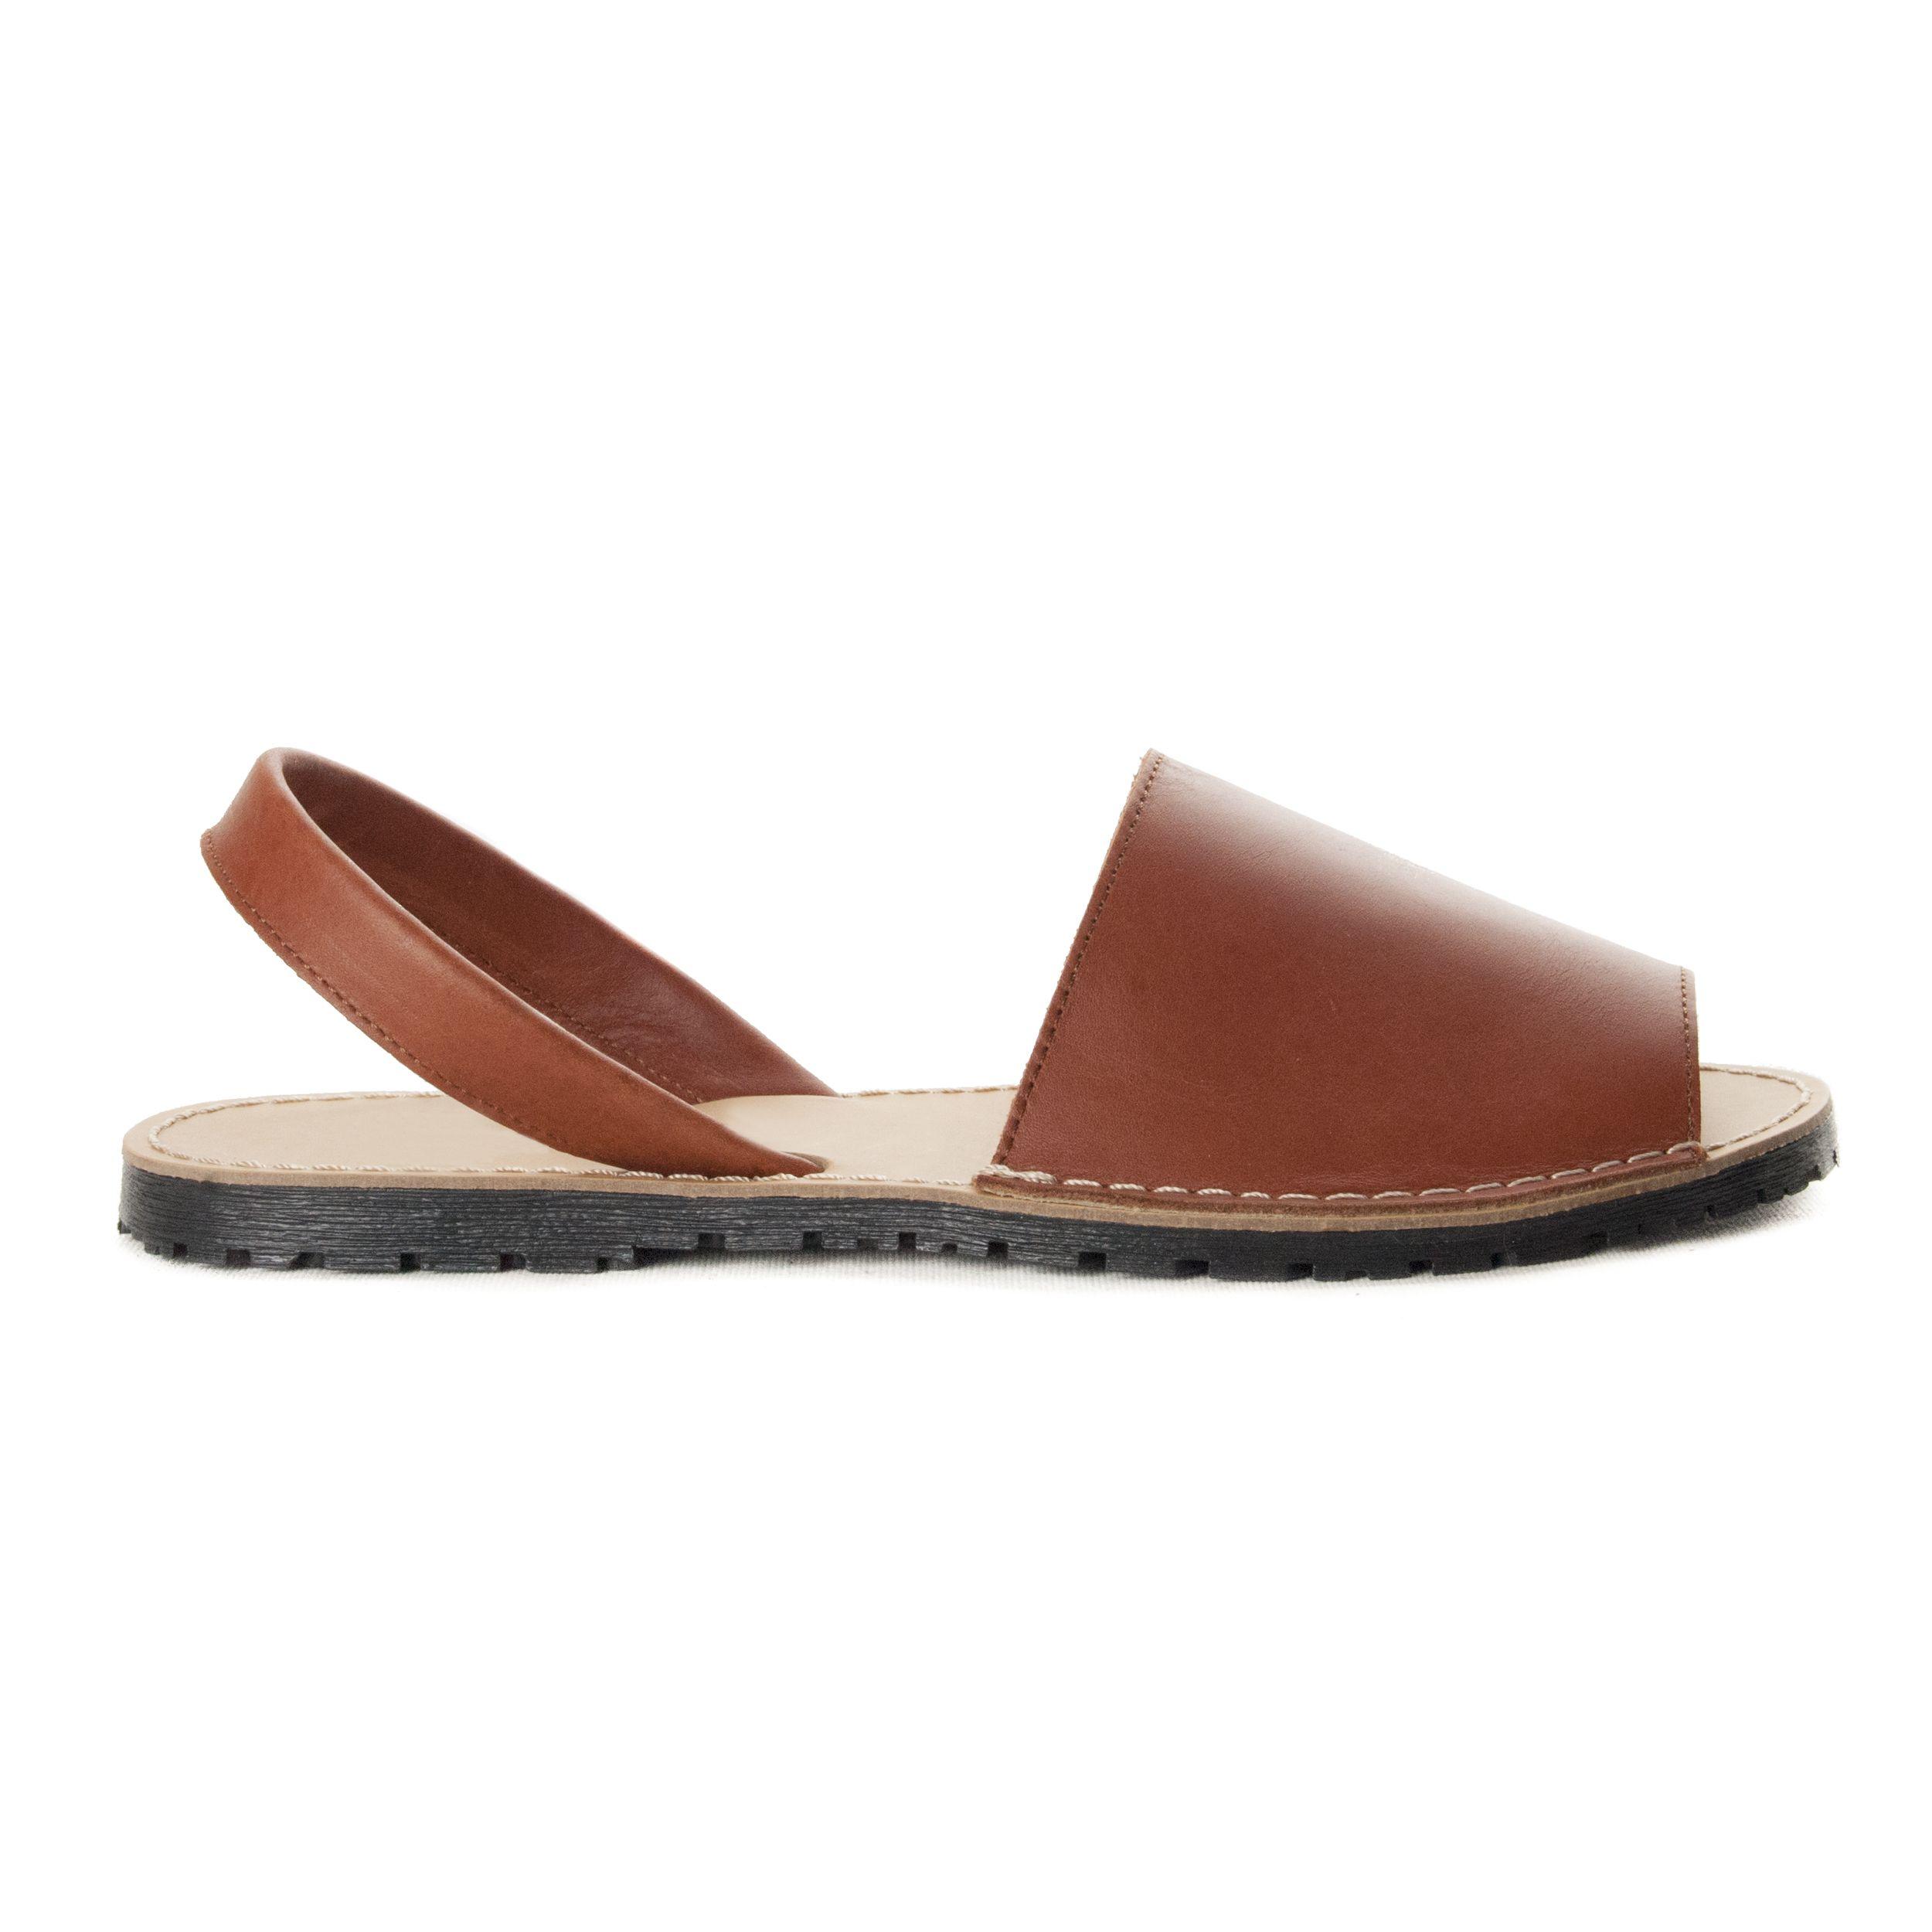 Montevita Slingback Flat Sandal in Camel